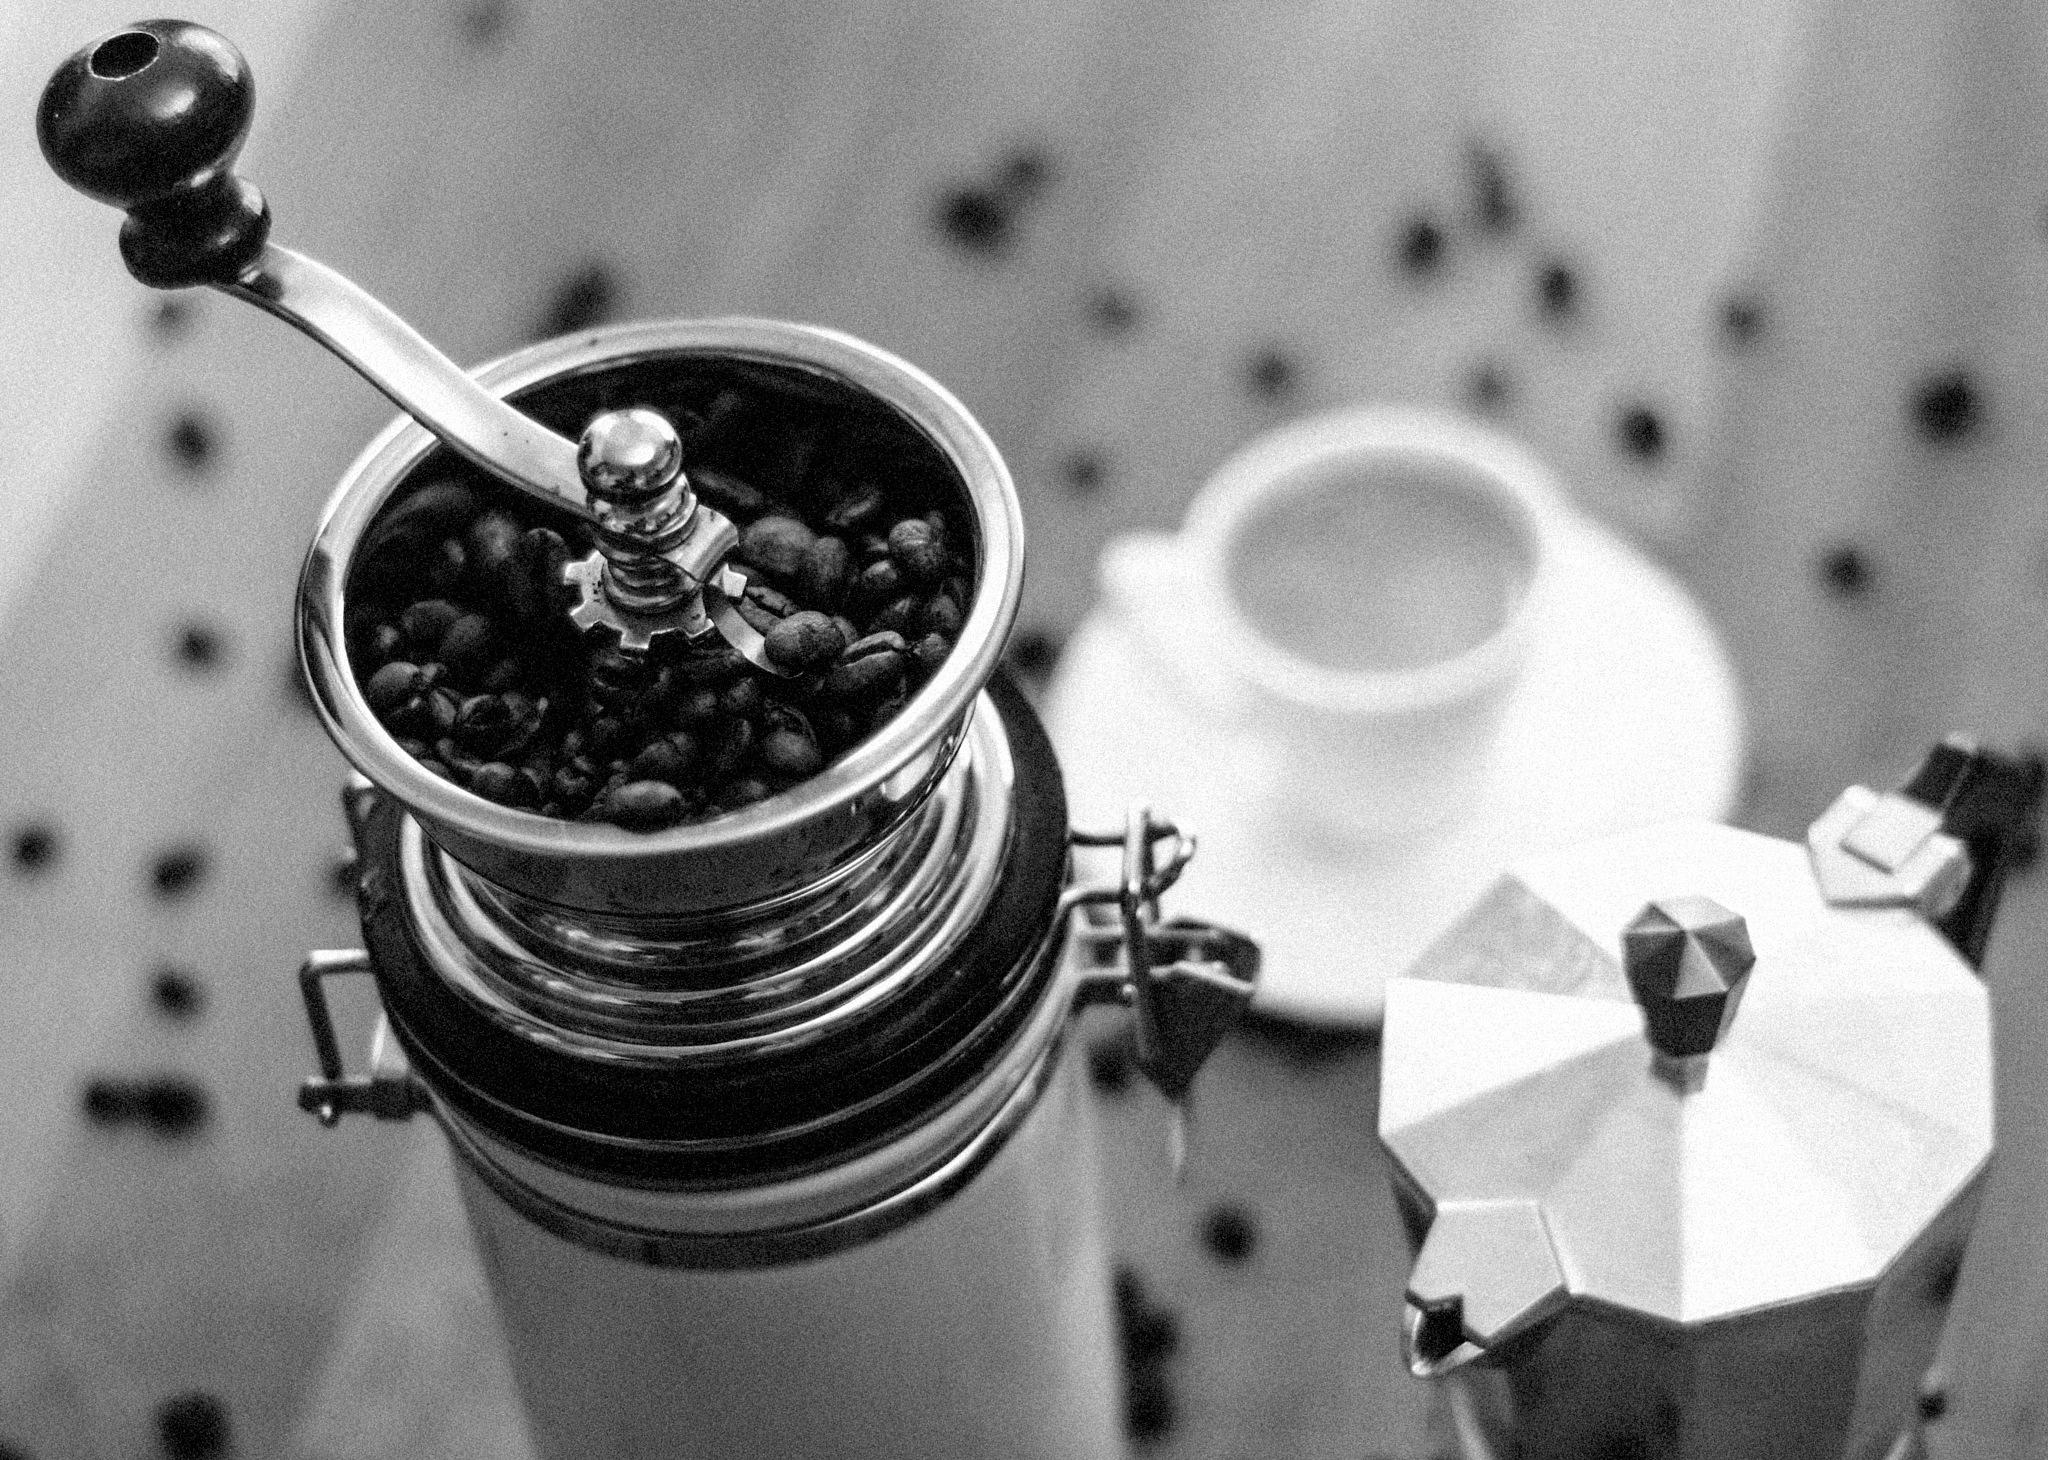 Coffee by Thorbjørn Weilby Spurre